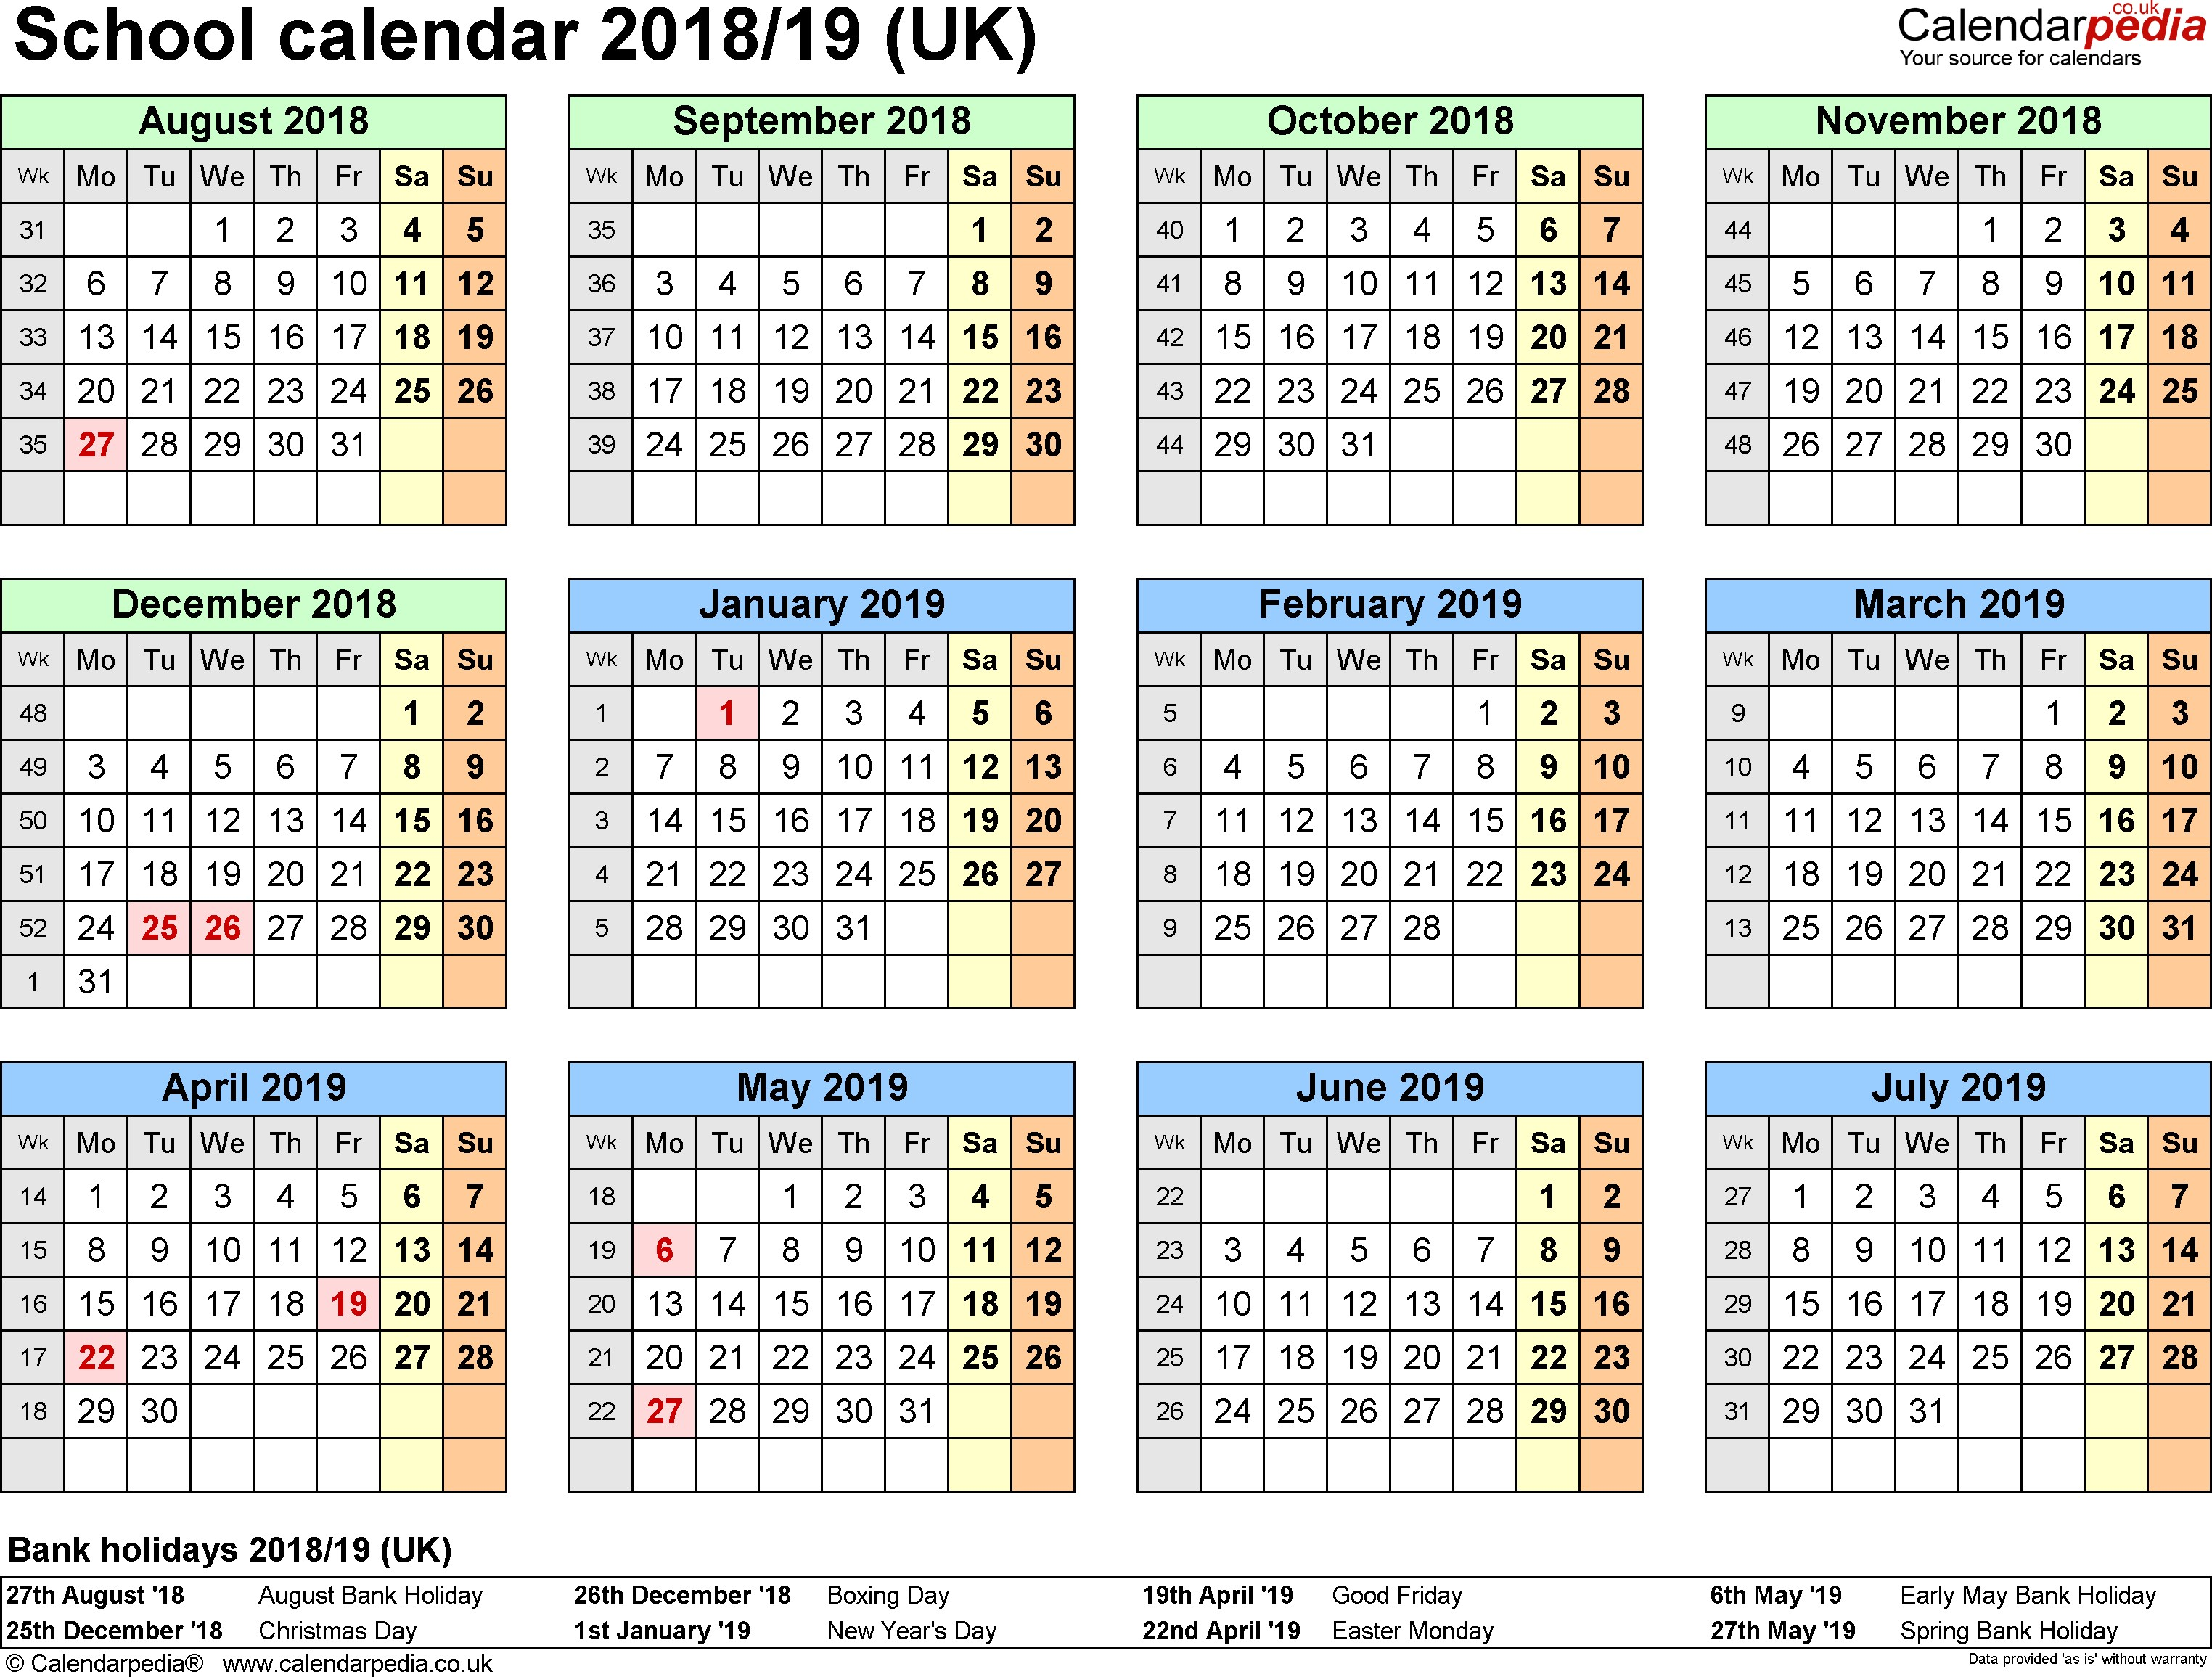 2018 and 2019 Calendar Template Excel Más Populares Calendarpedia Sample 2550x3300 Excel 2020 Que